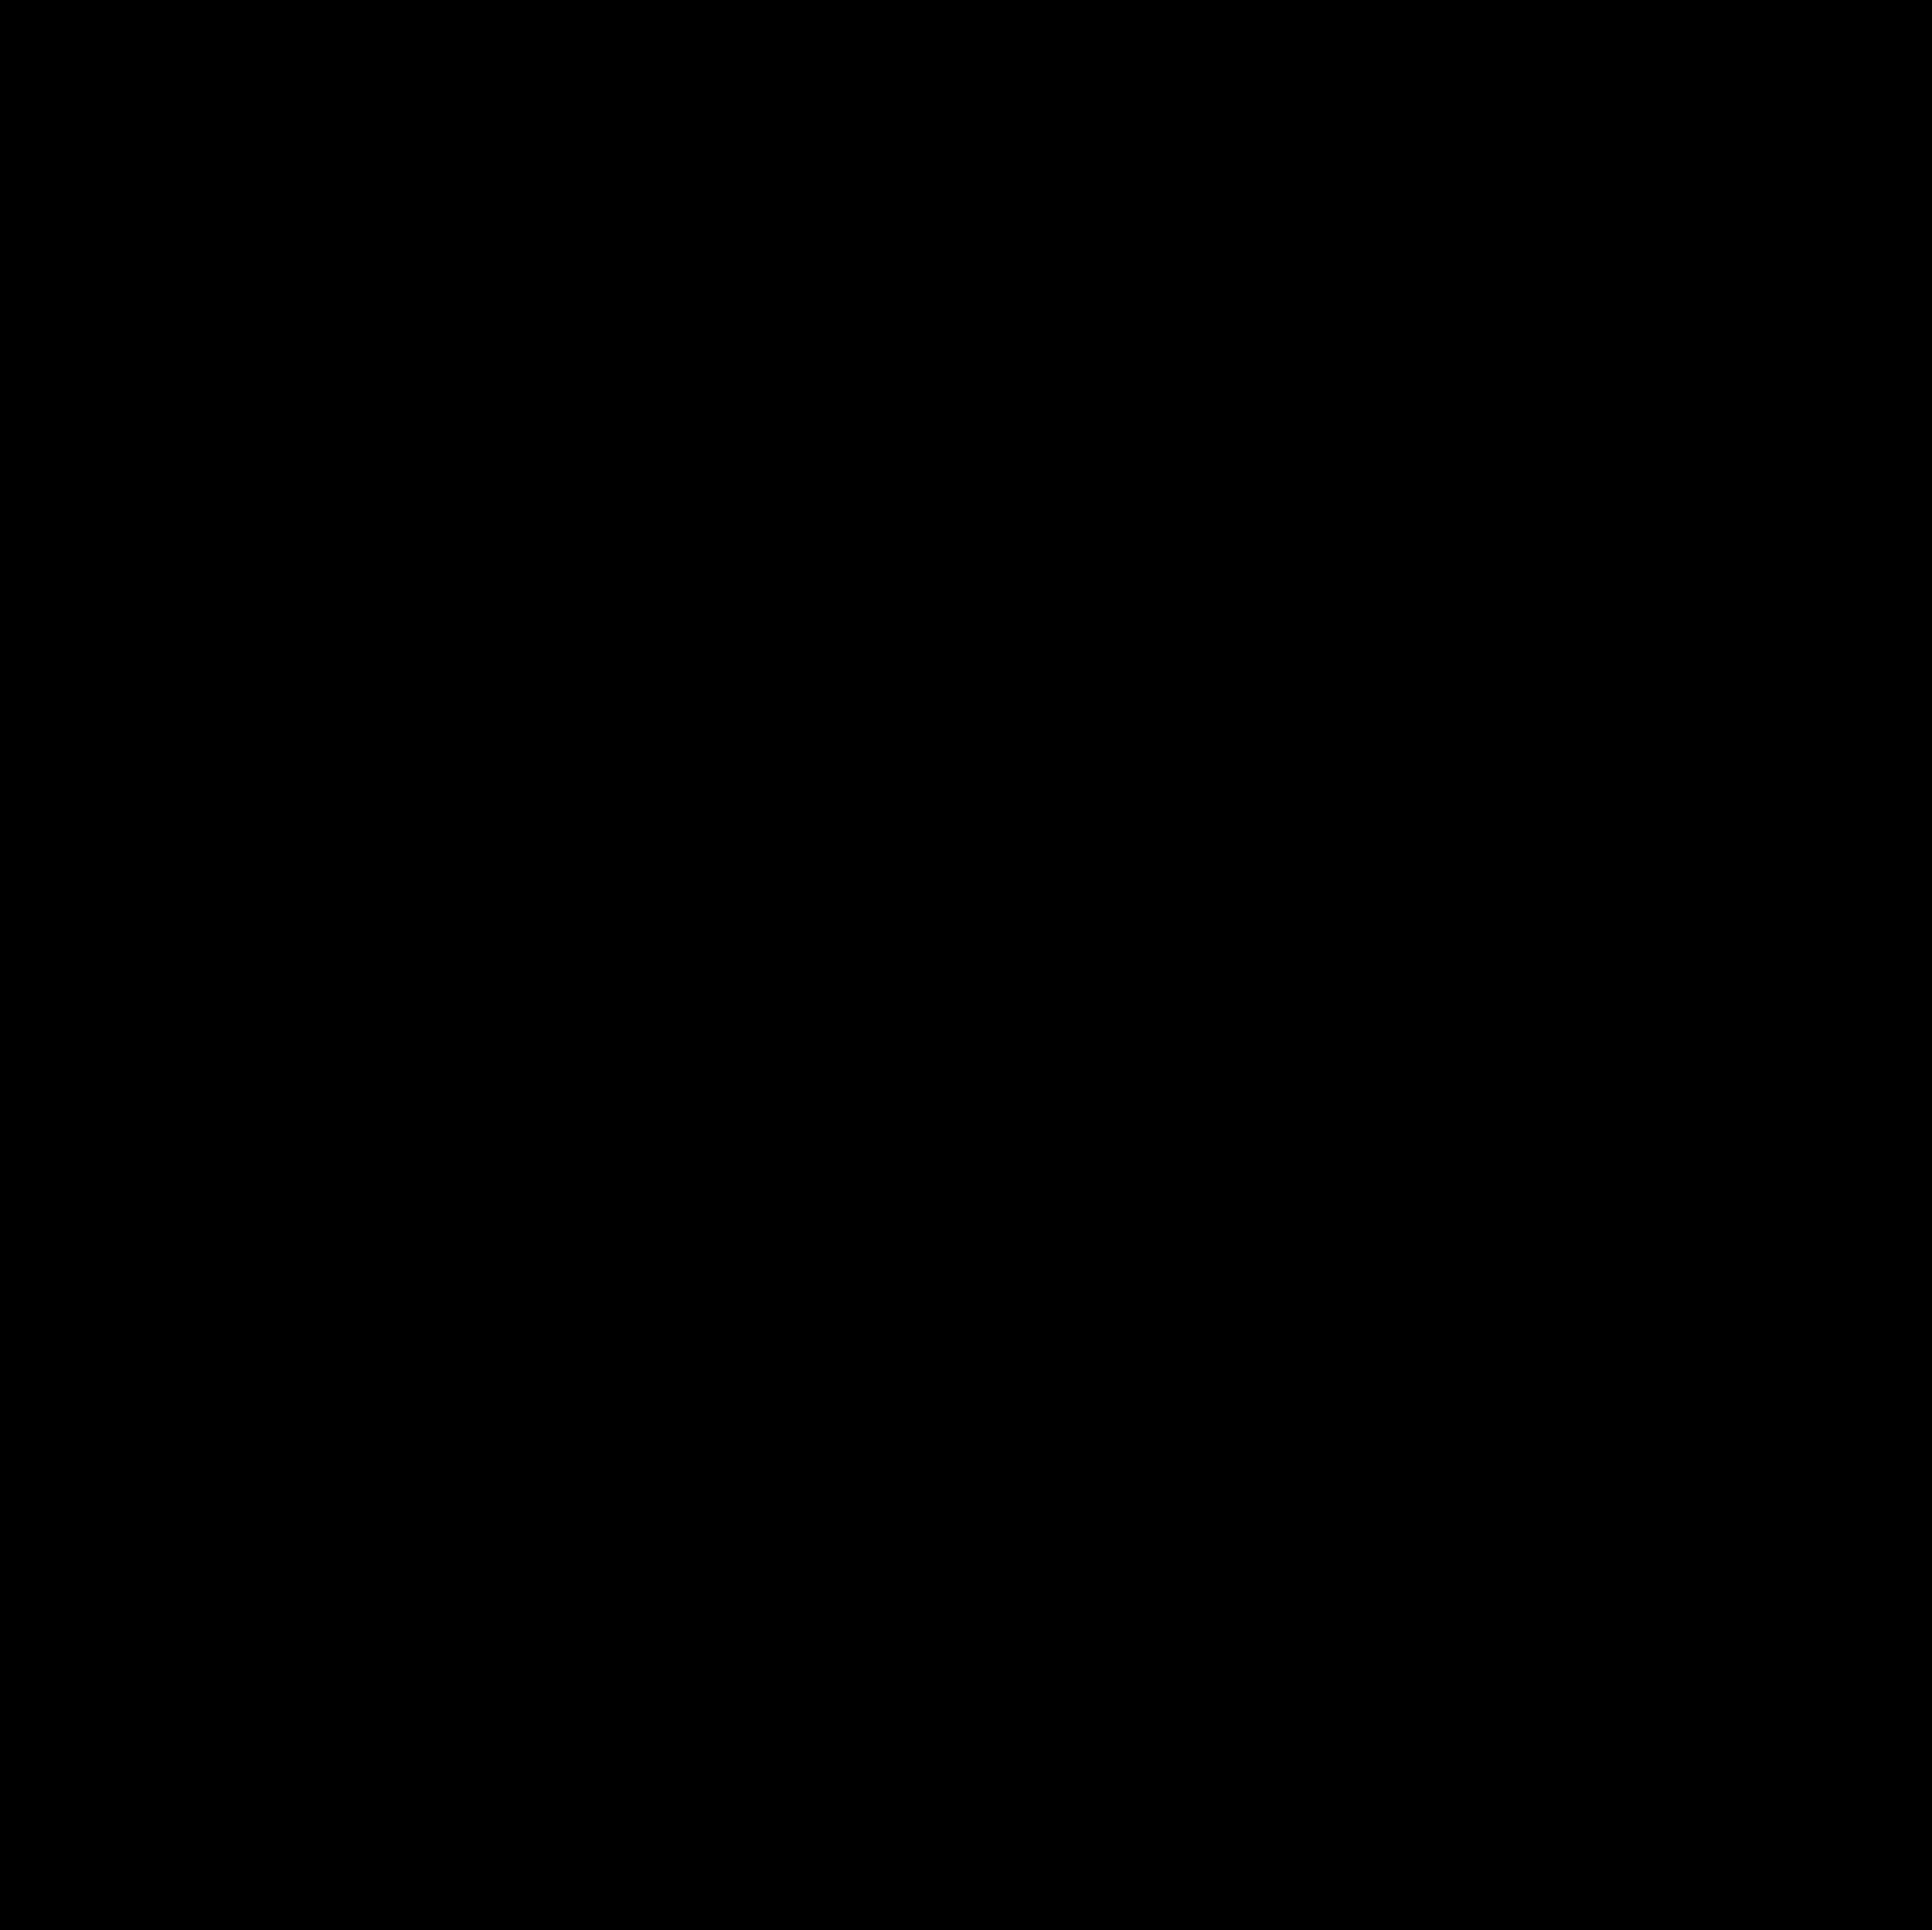 2382x2380 Samson Logo1 Black Name Ashley Pate Art